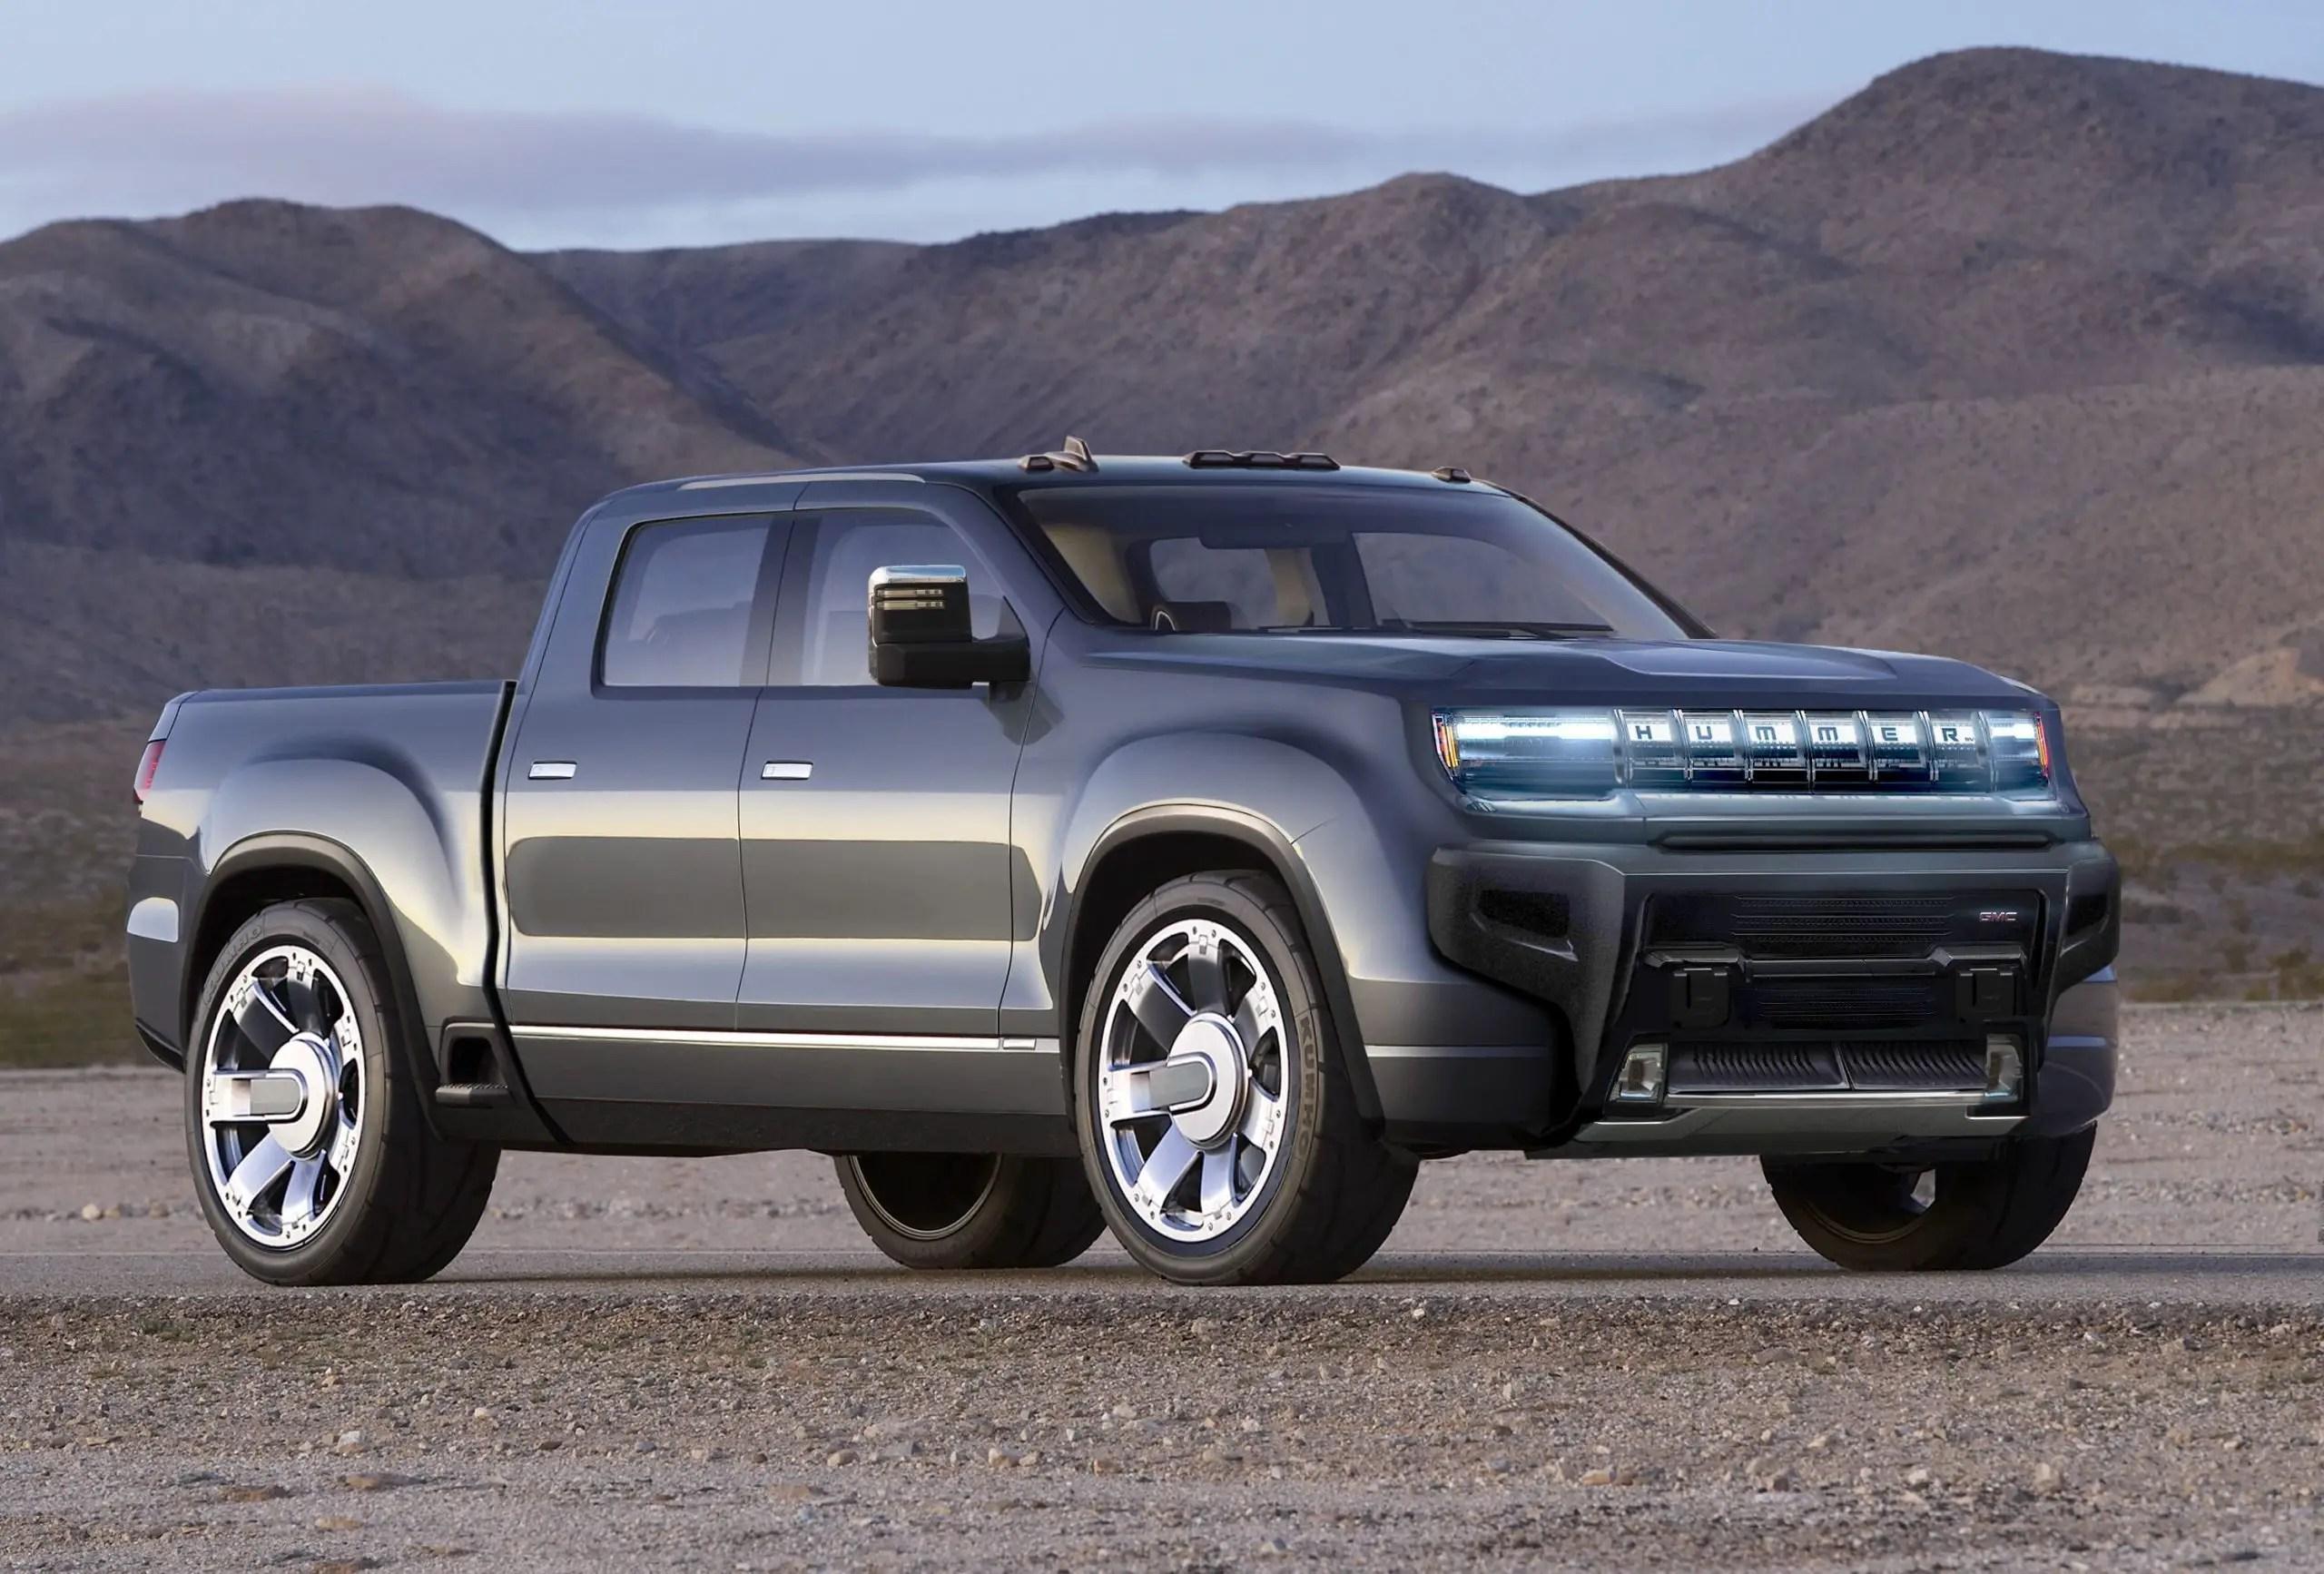 2022 GMC Hummer EV ilusstrations